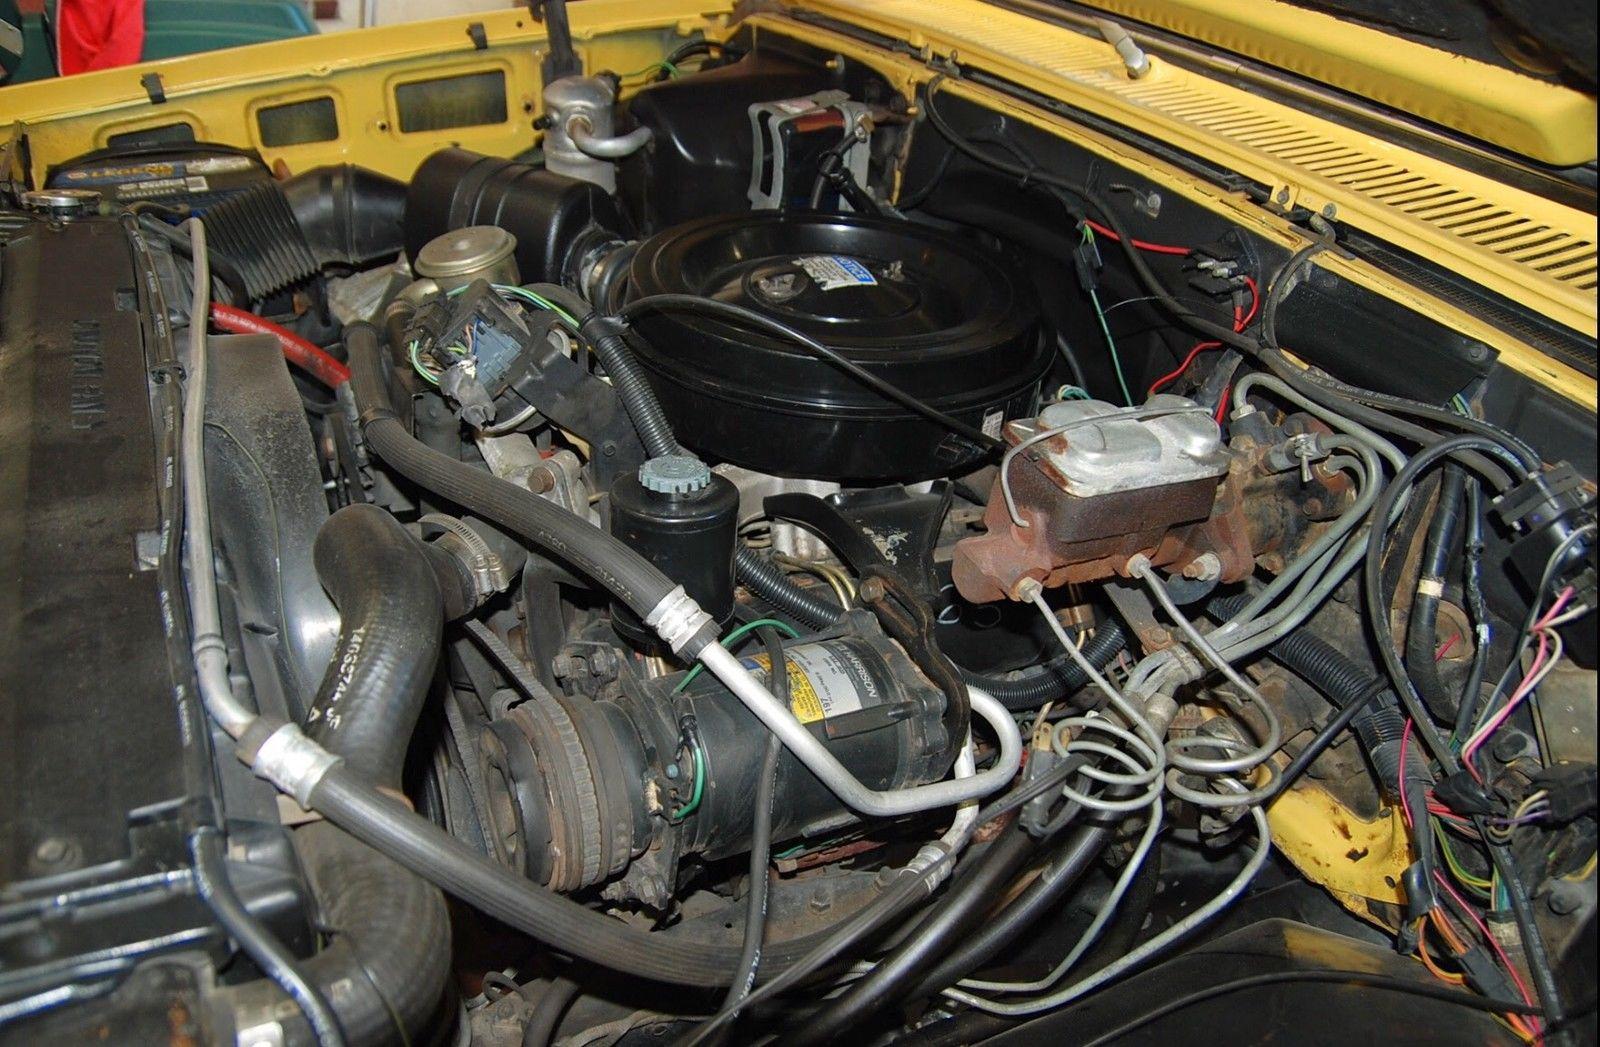 1983 Chevy Blazer Silverado 6 2 Diesel 59 000 Original